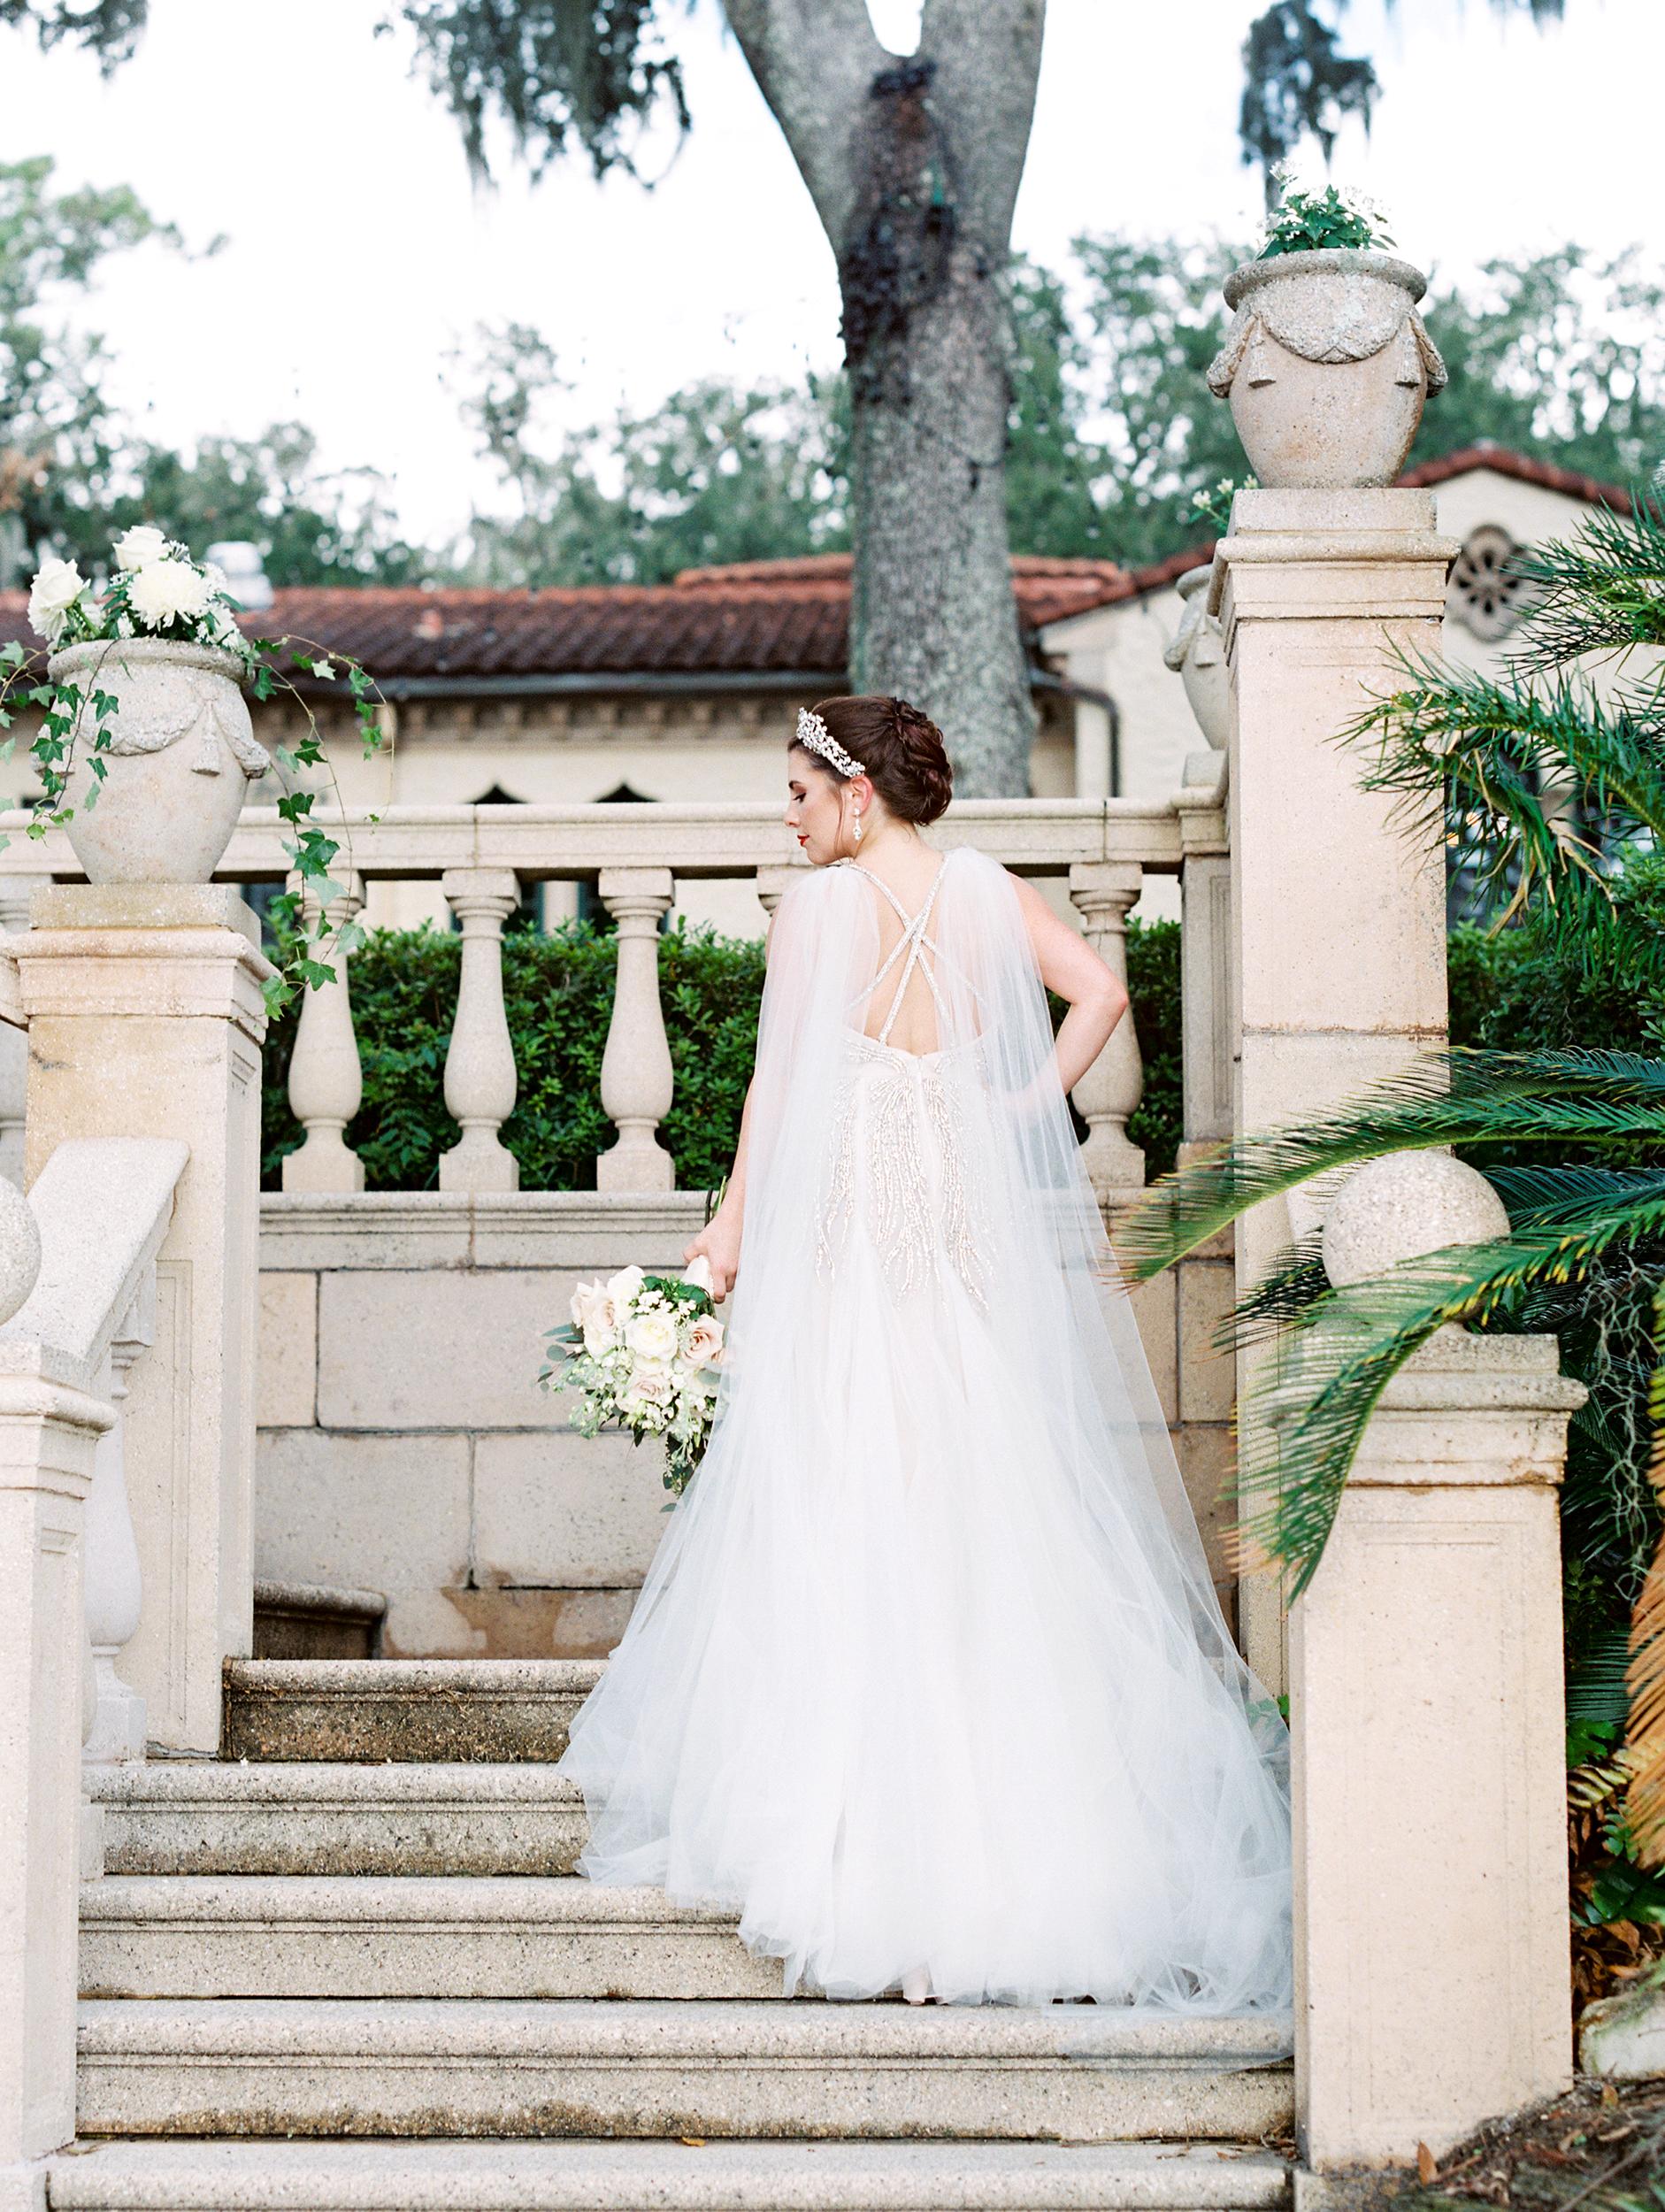 Lisa Silva Photography- Jacksonville, Florida Fine Art Film Wedding Photography Epping Forrest Yacht Club 11.jpg